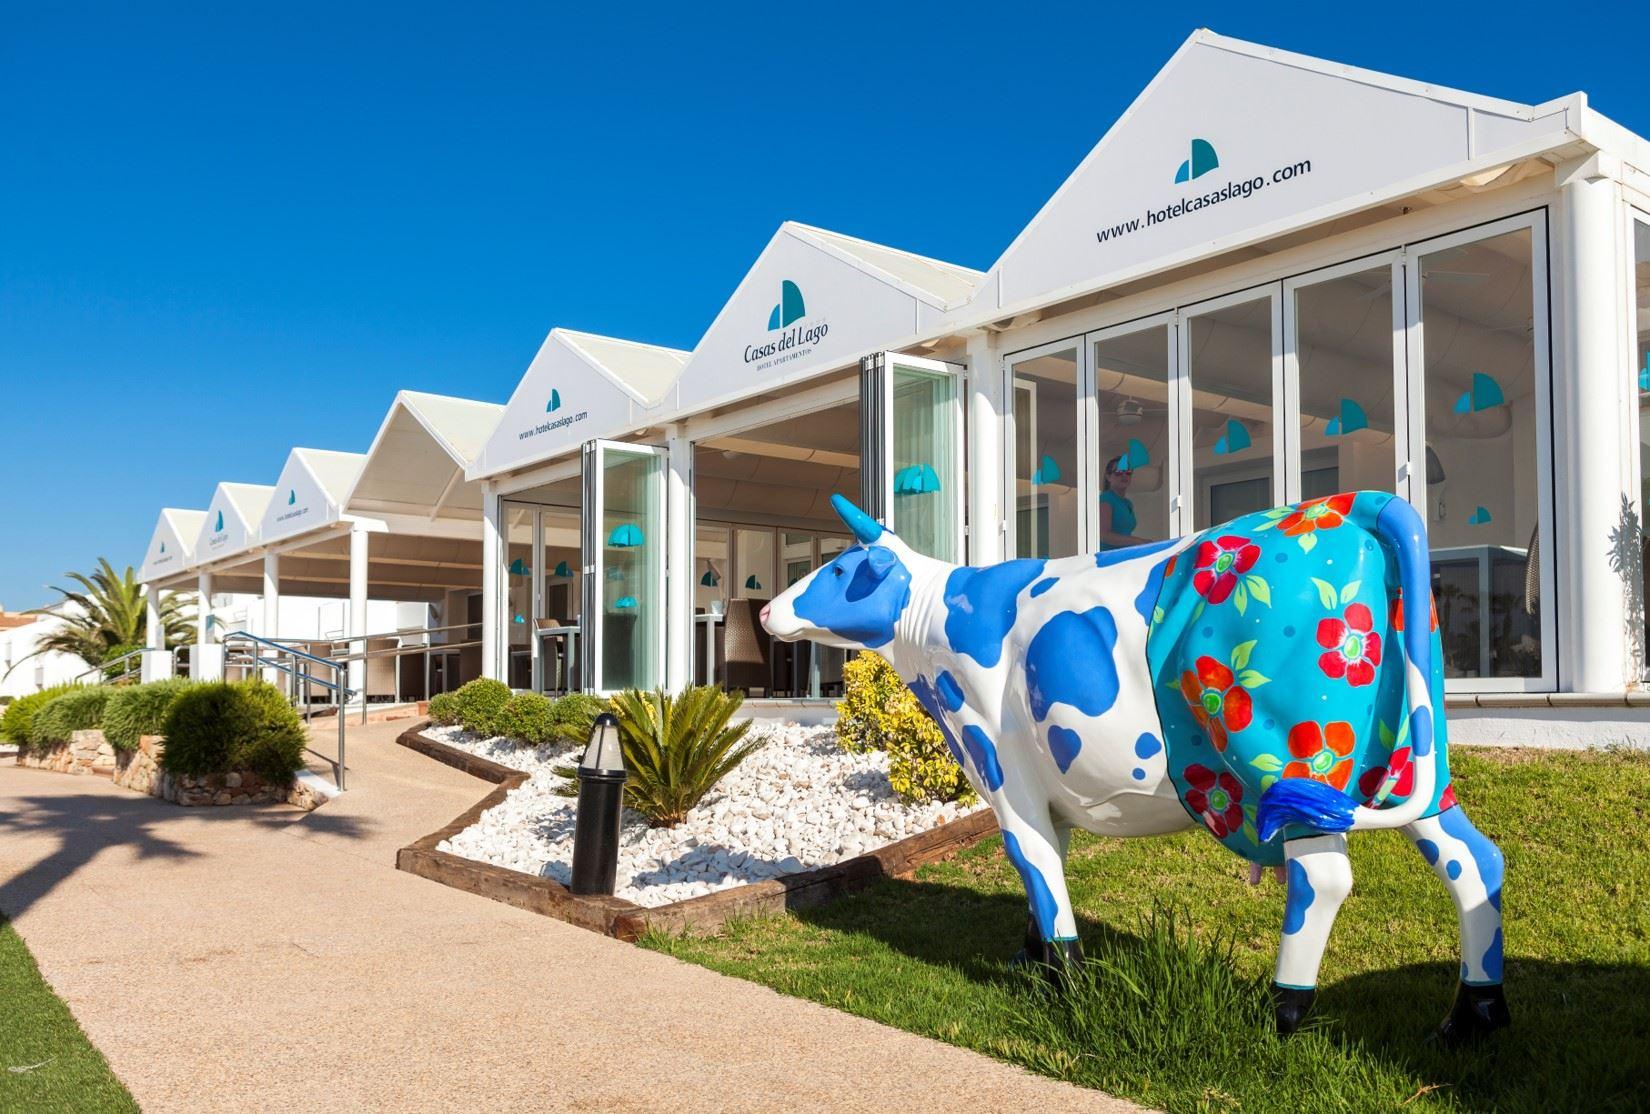 Exteriör Hotell Casas Del Lago & Beach Club, Cala'n Bosch Menorca